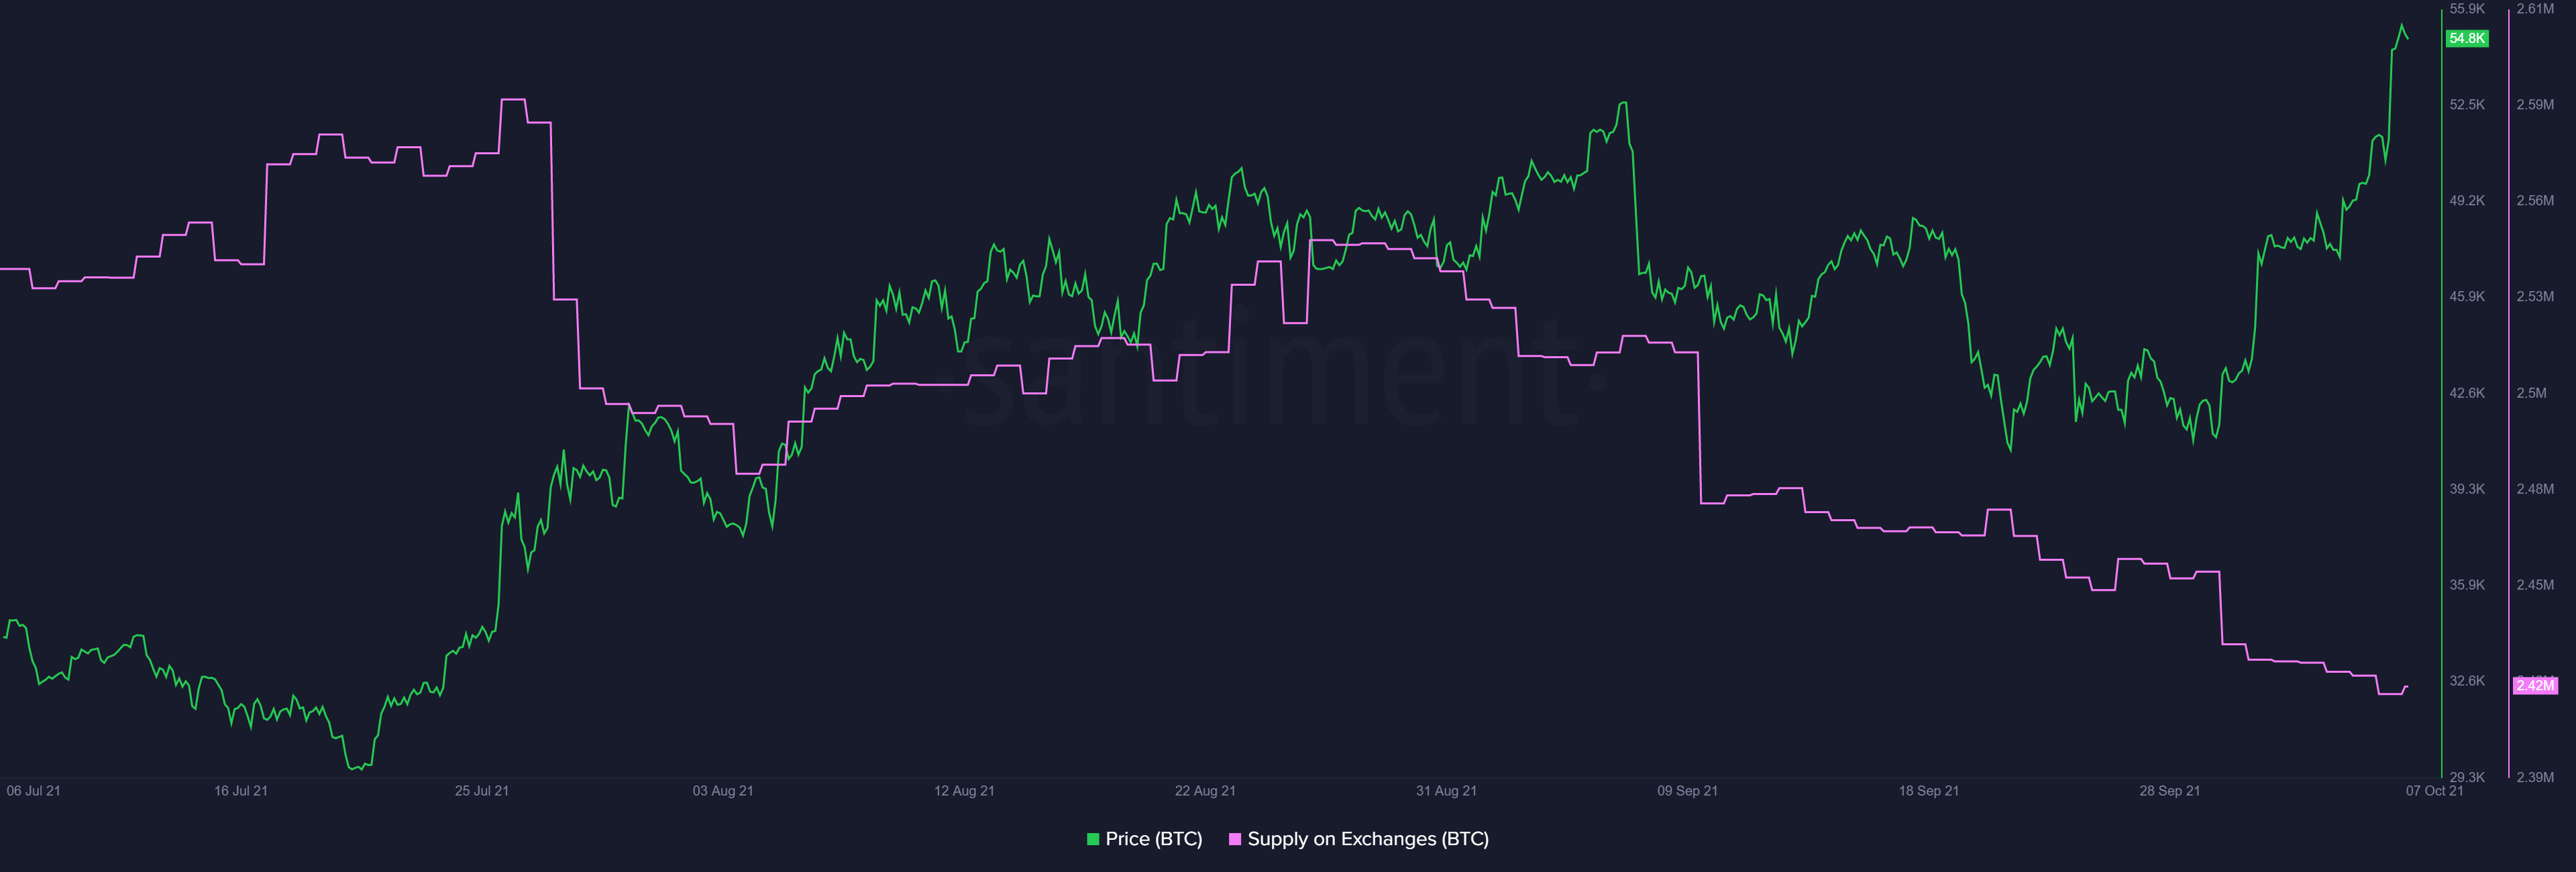 Bitcoin exchange supply chart